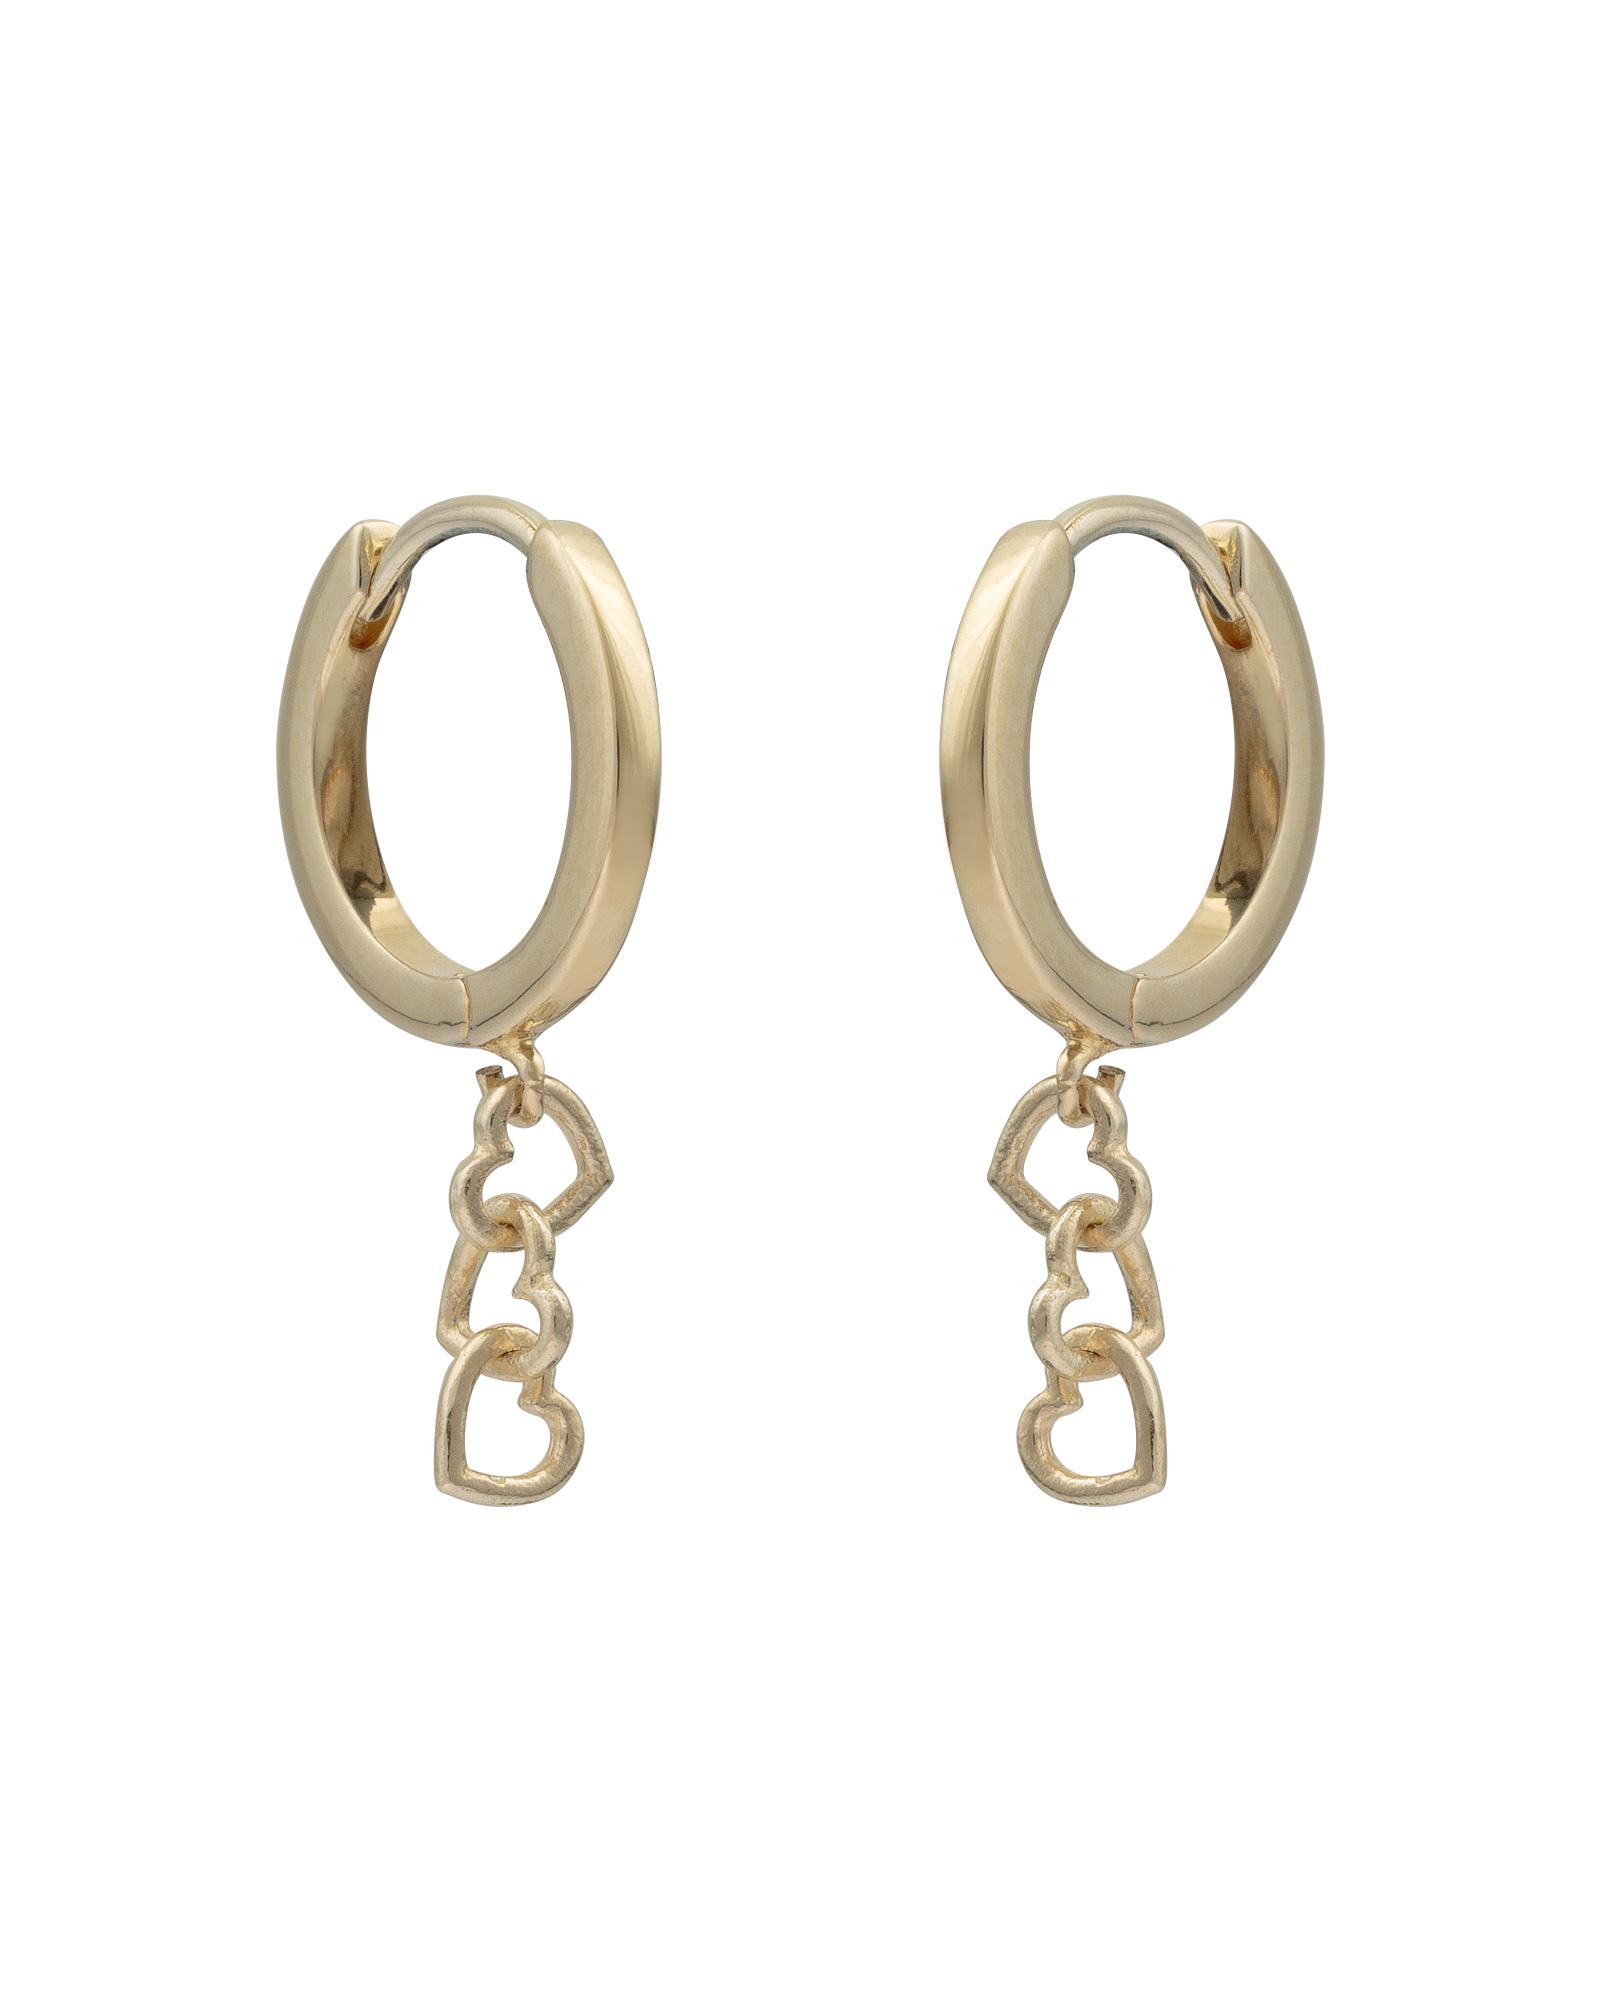 61368e742 Oliver Bonas. Women's Metallic Lovable Interlinked Hearts Gold Plated  Huggie Earrings